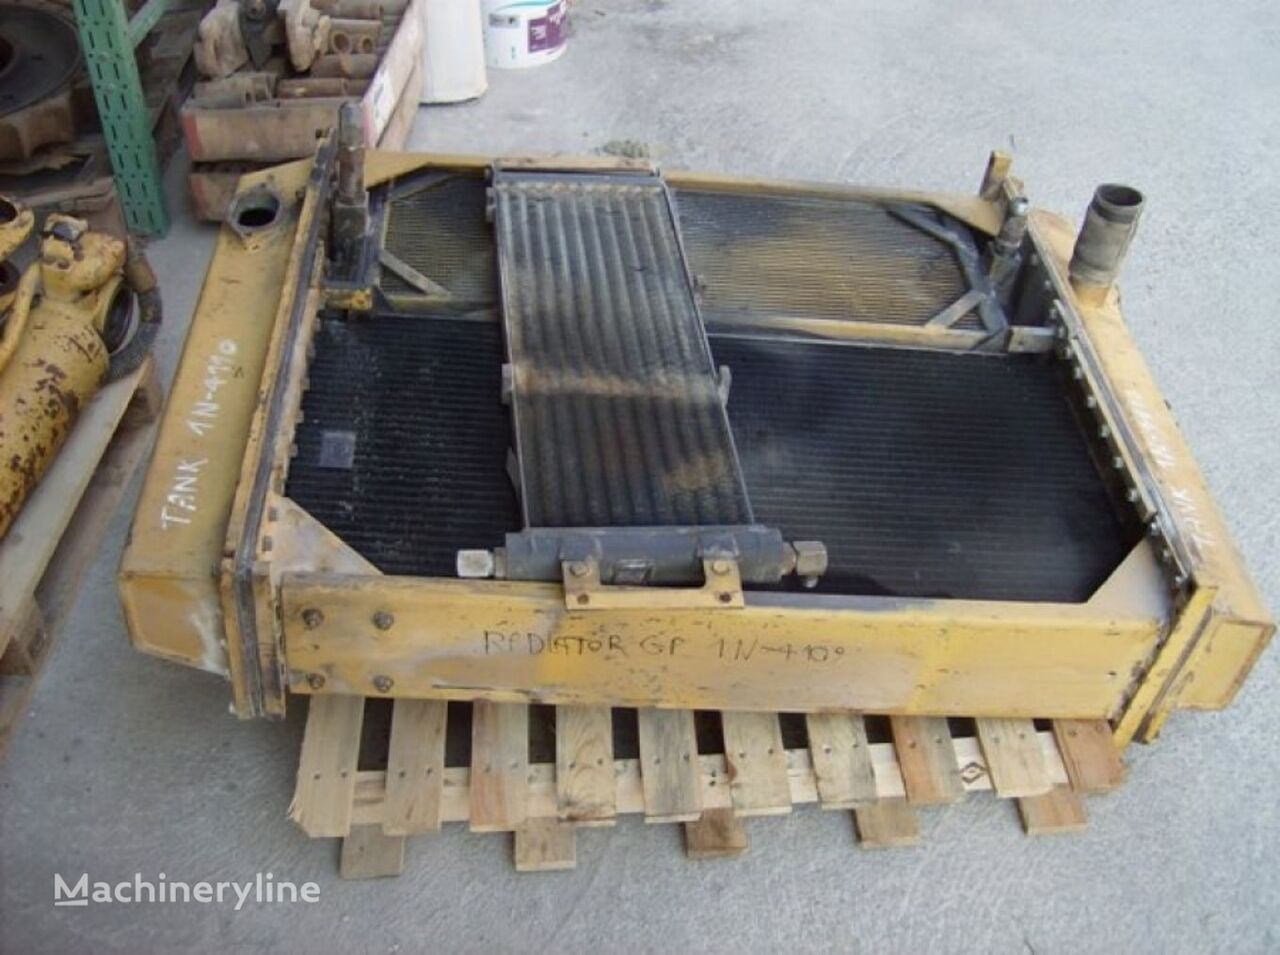 RADIATOR TANK 18Z01396 engine cooling radiator for CATERPILLAR 963 18Z01396 wheel loader